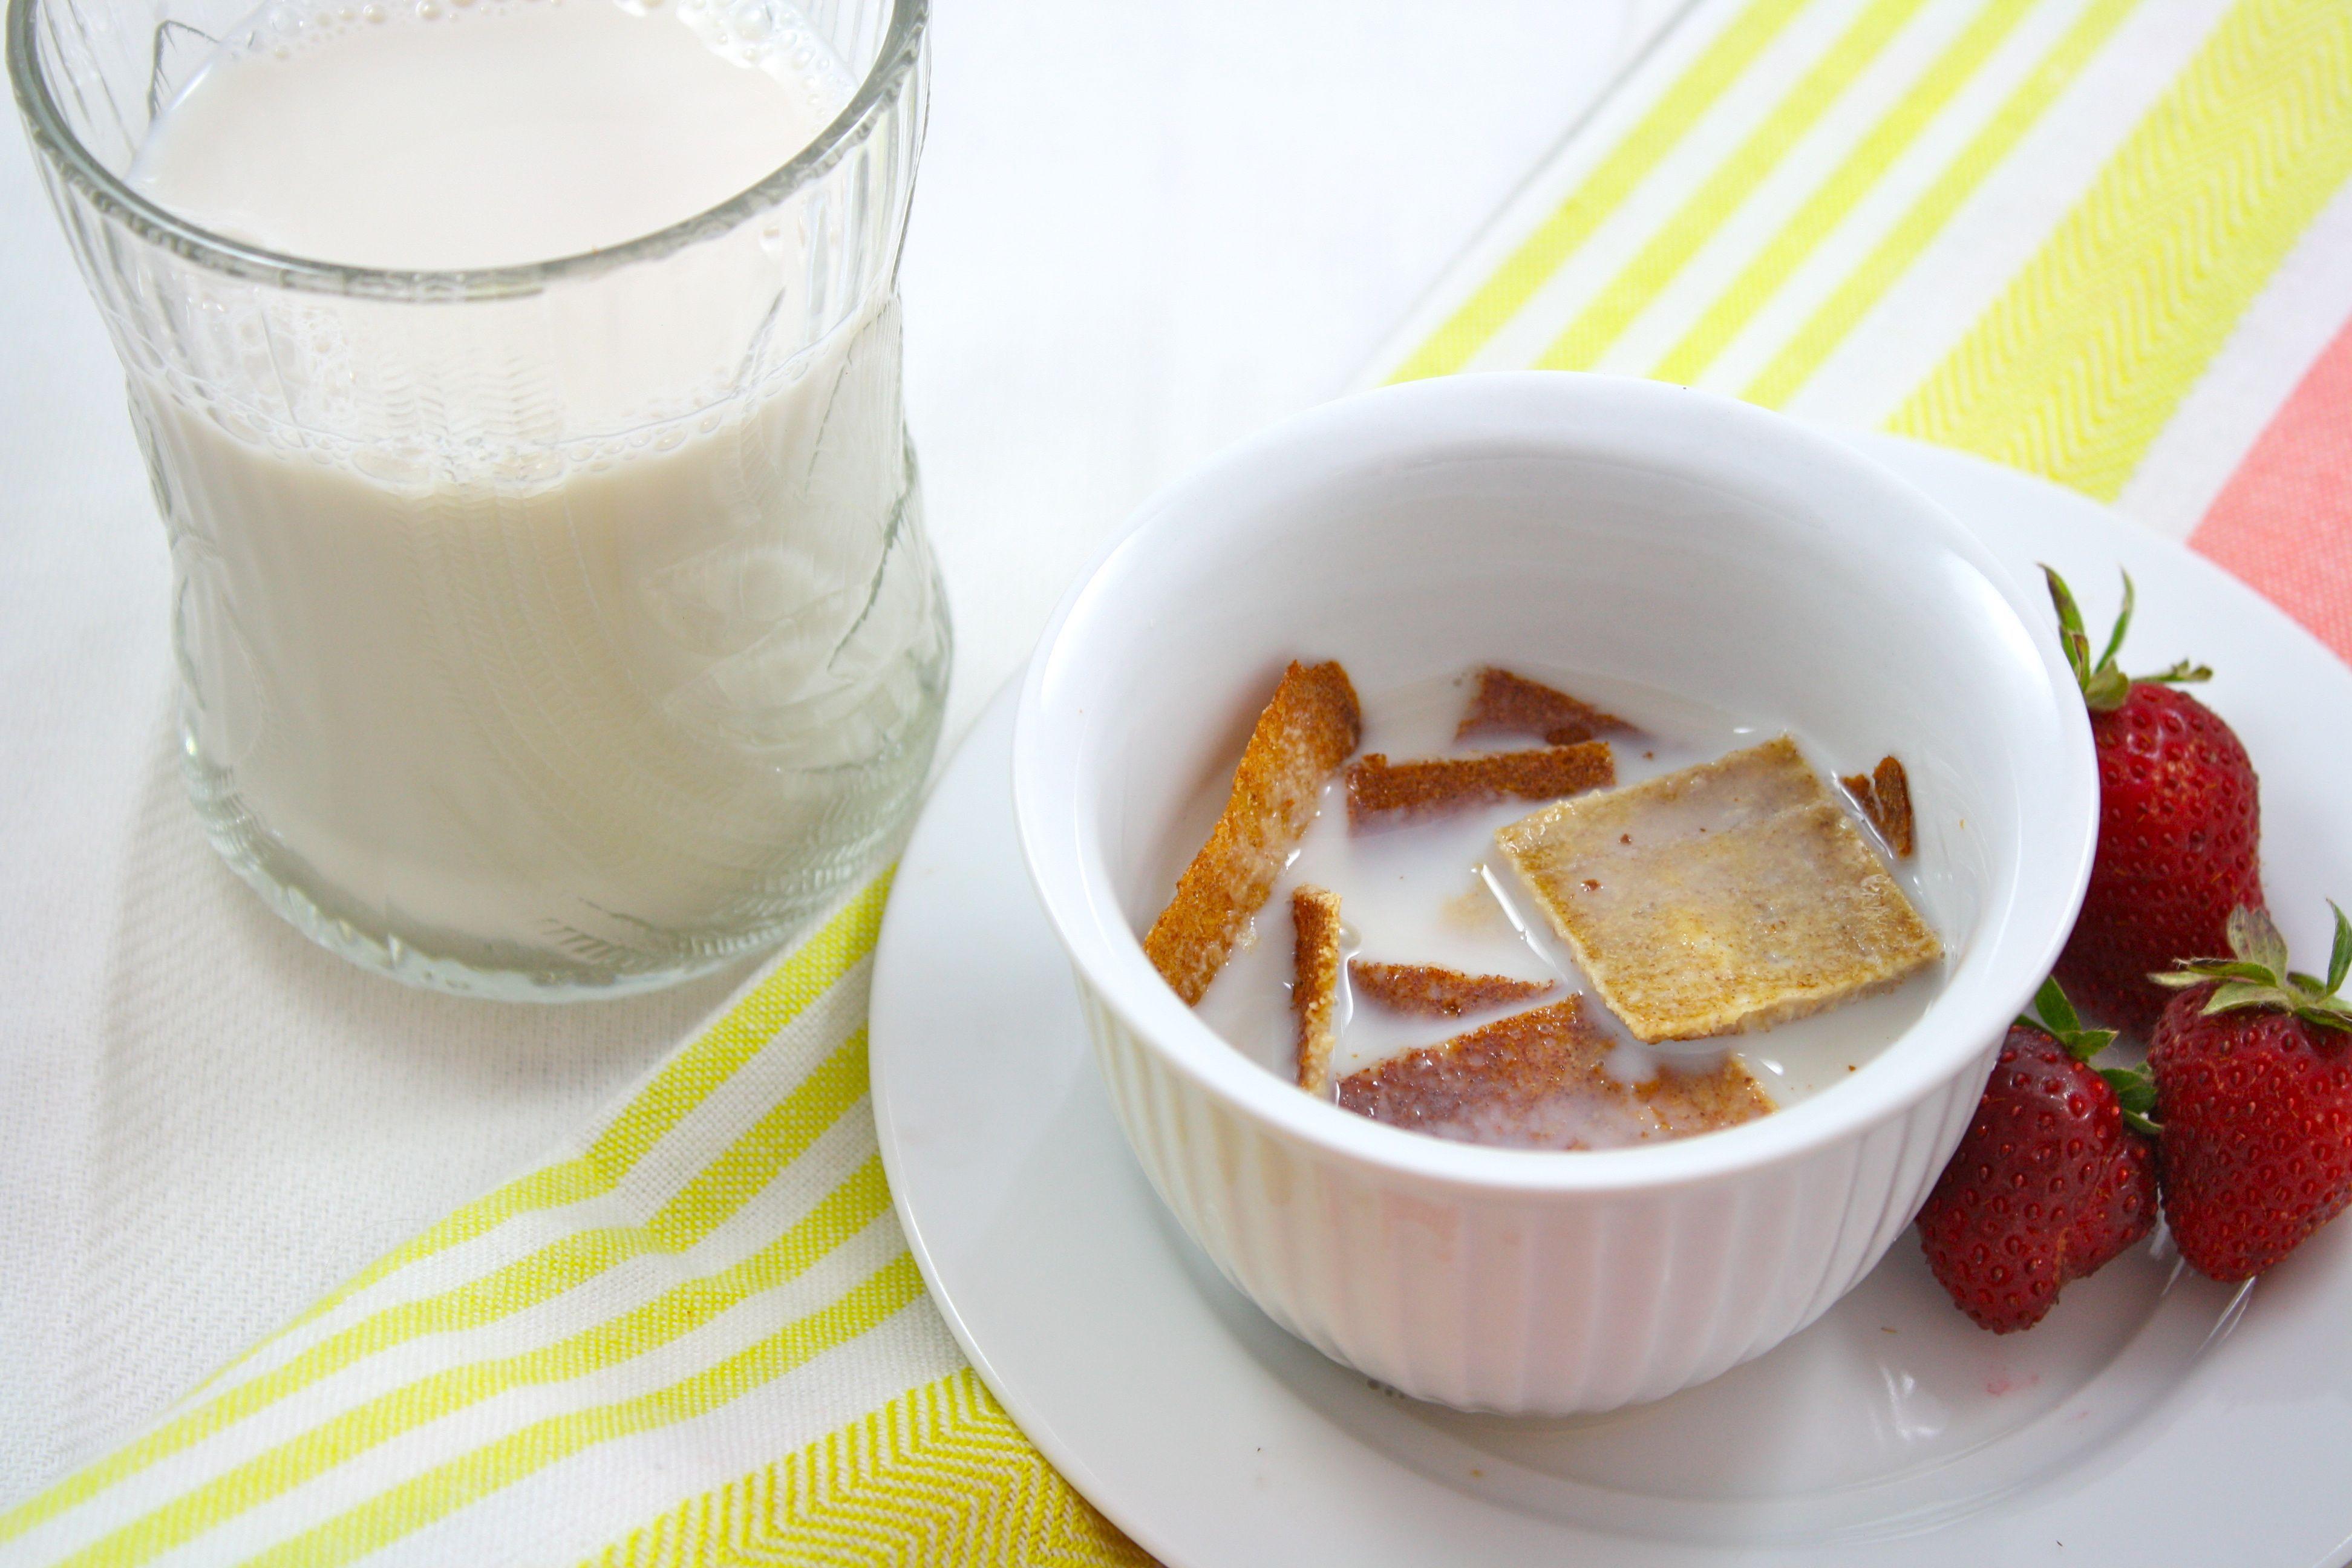 Homemade Low Carb Cinnamon Toast Crunch - Foodie Fiasco- sub for coconut flour or almond #cinnamontoastcrunch Homemade Low Carb Cinnamon Toast Crunch - Foodie Fiasco- sub for coconut flour or almond #cinnamontoastcrunch